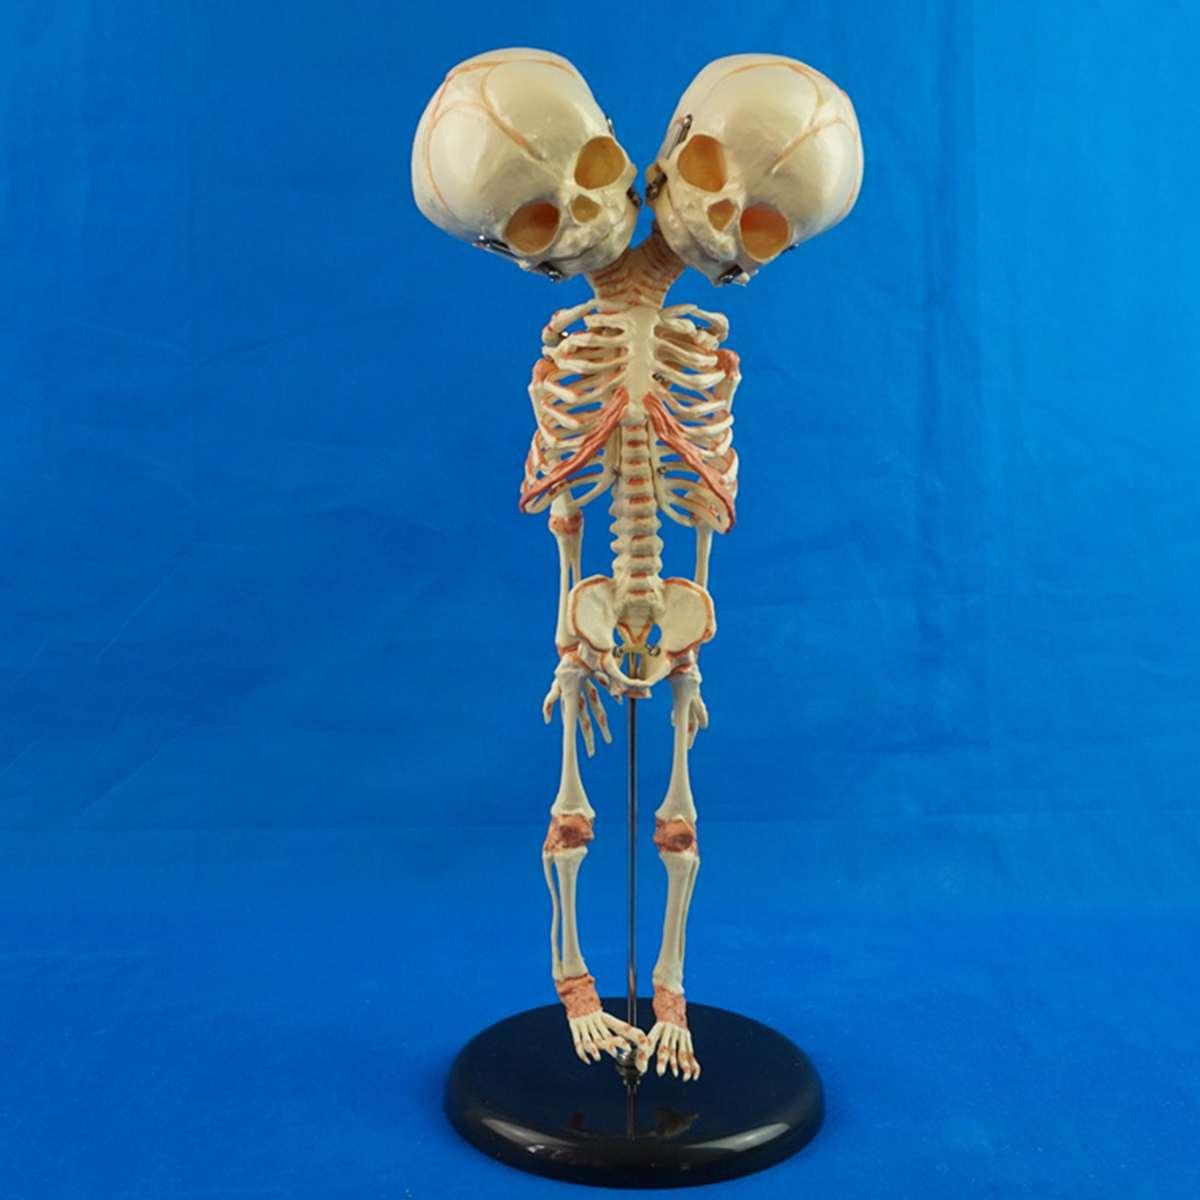 37cm Human New Double Head Baby Anatomy Skull Skeleton Anatomical Brain Anatomy Education Model Anatomical Study Display